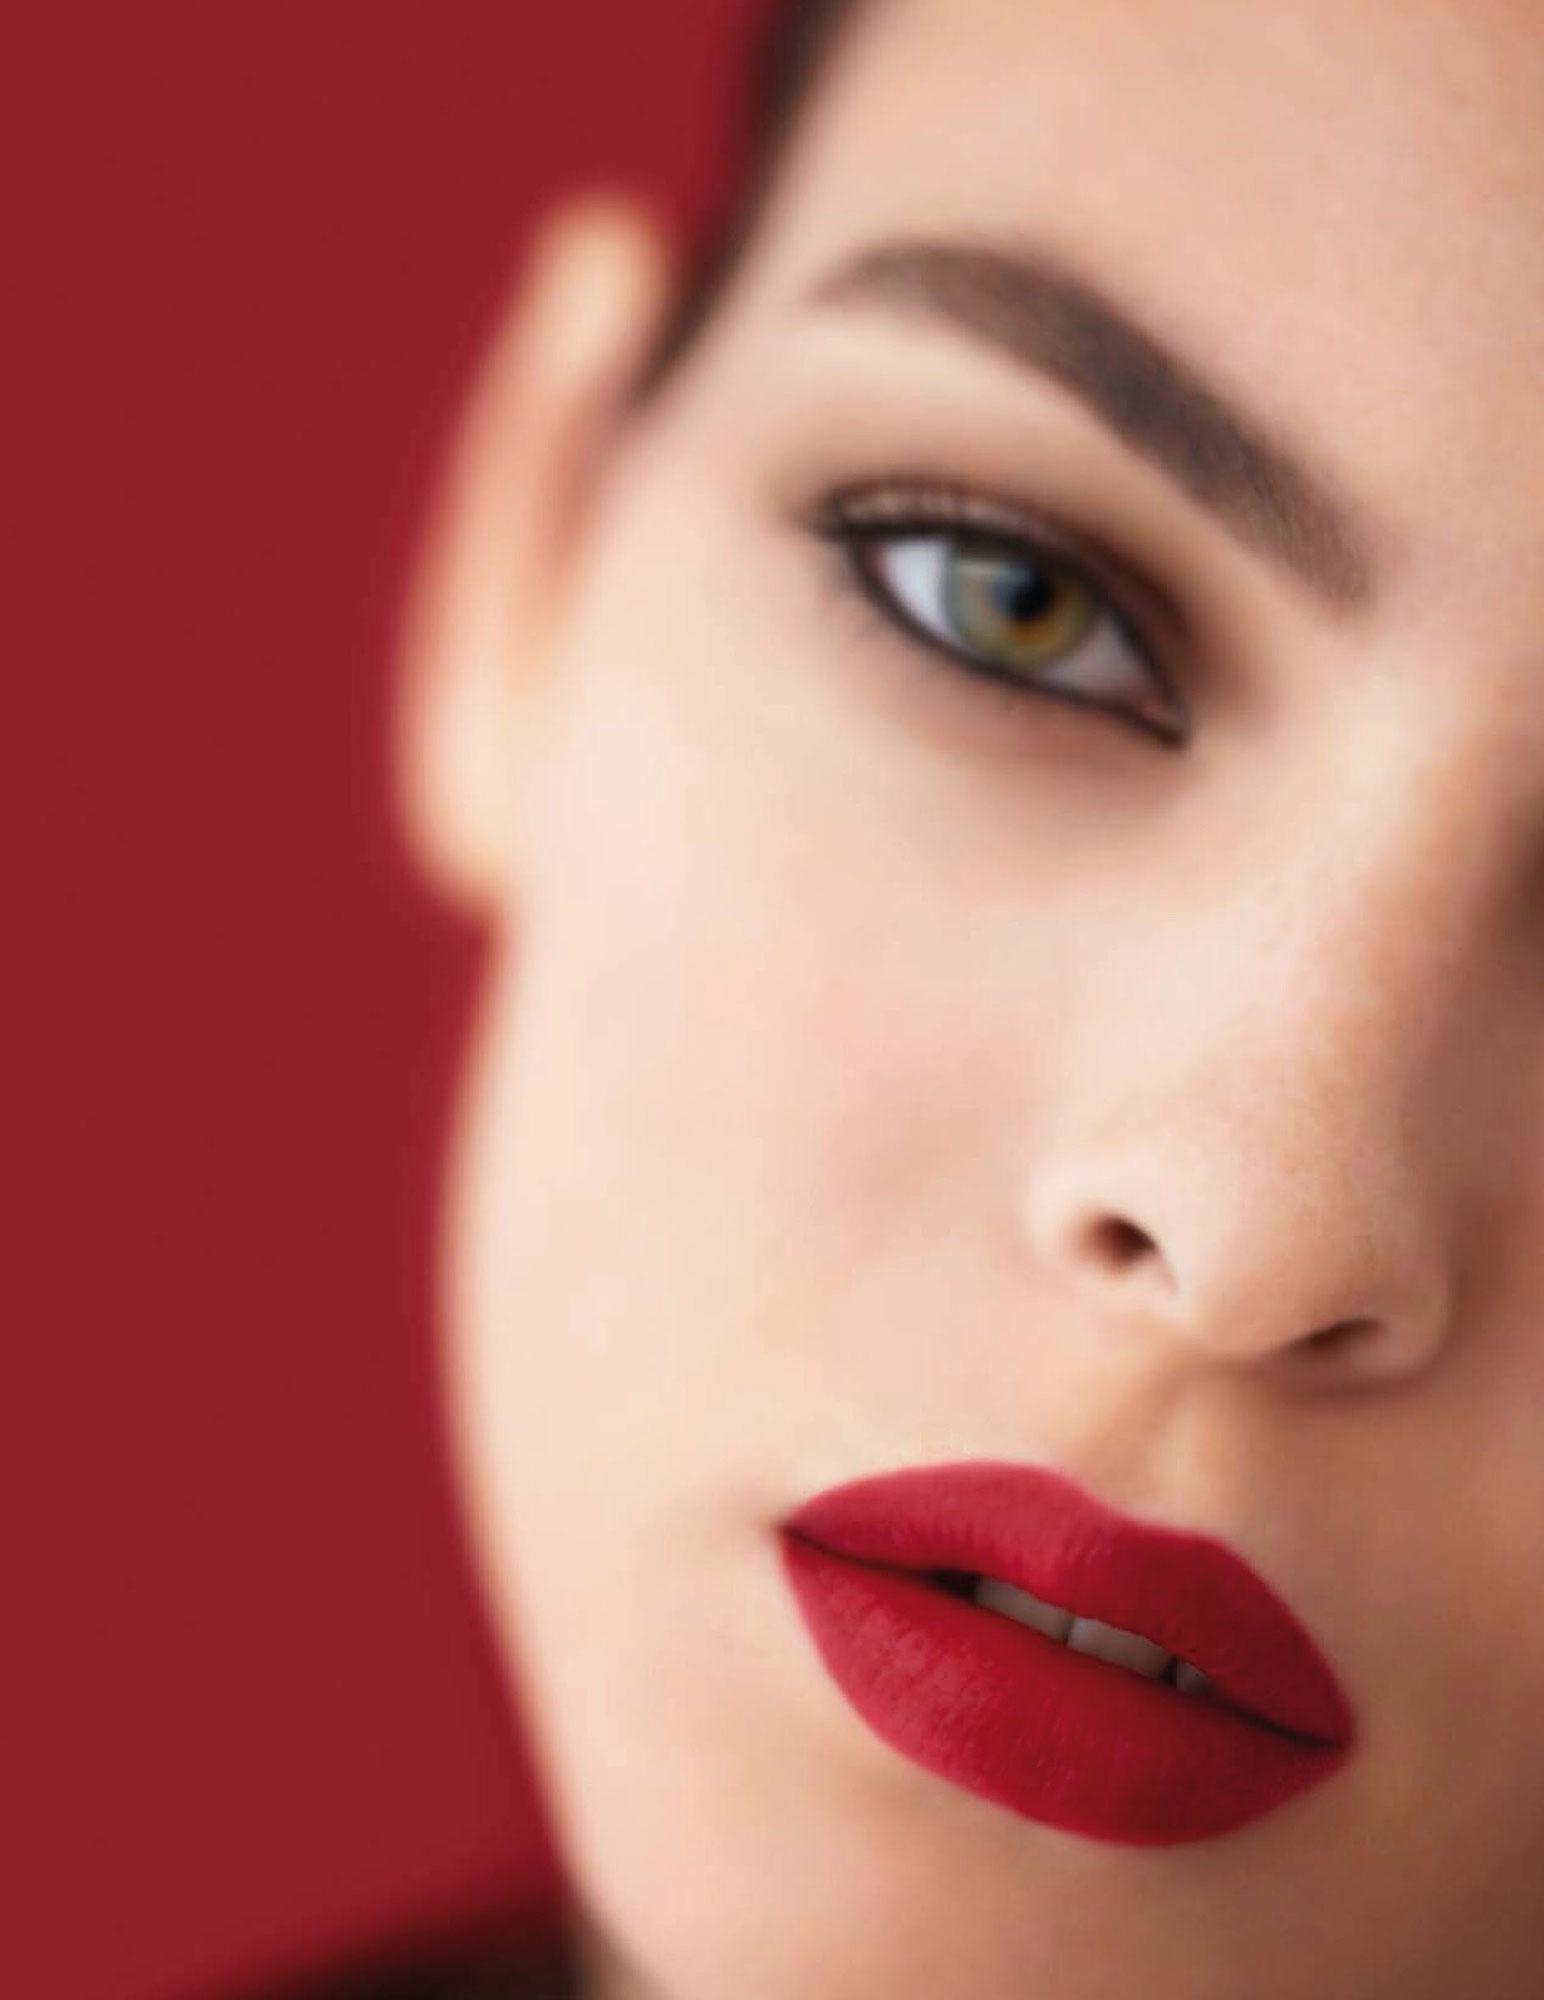 Chanel-Rouge-Allure-Liquid-Powder-Matte-beauty